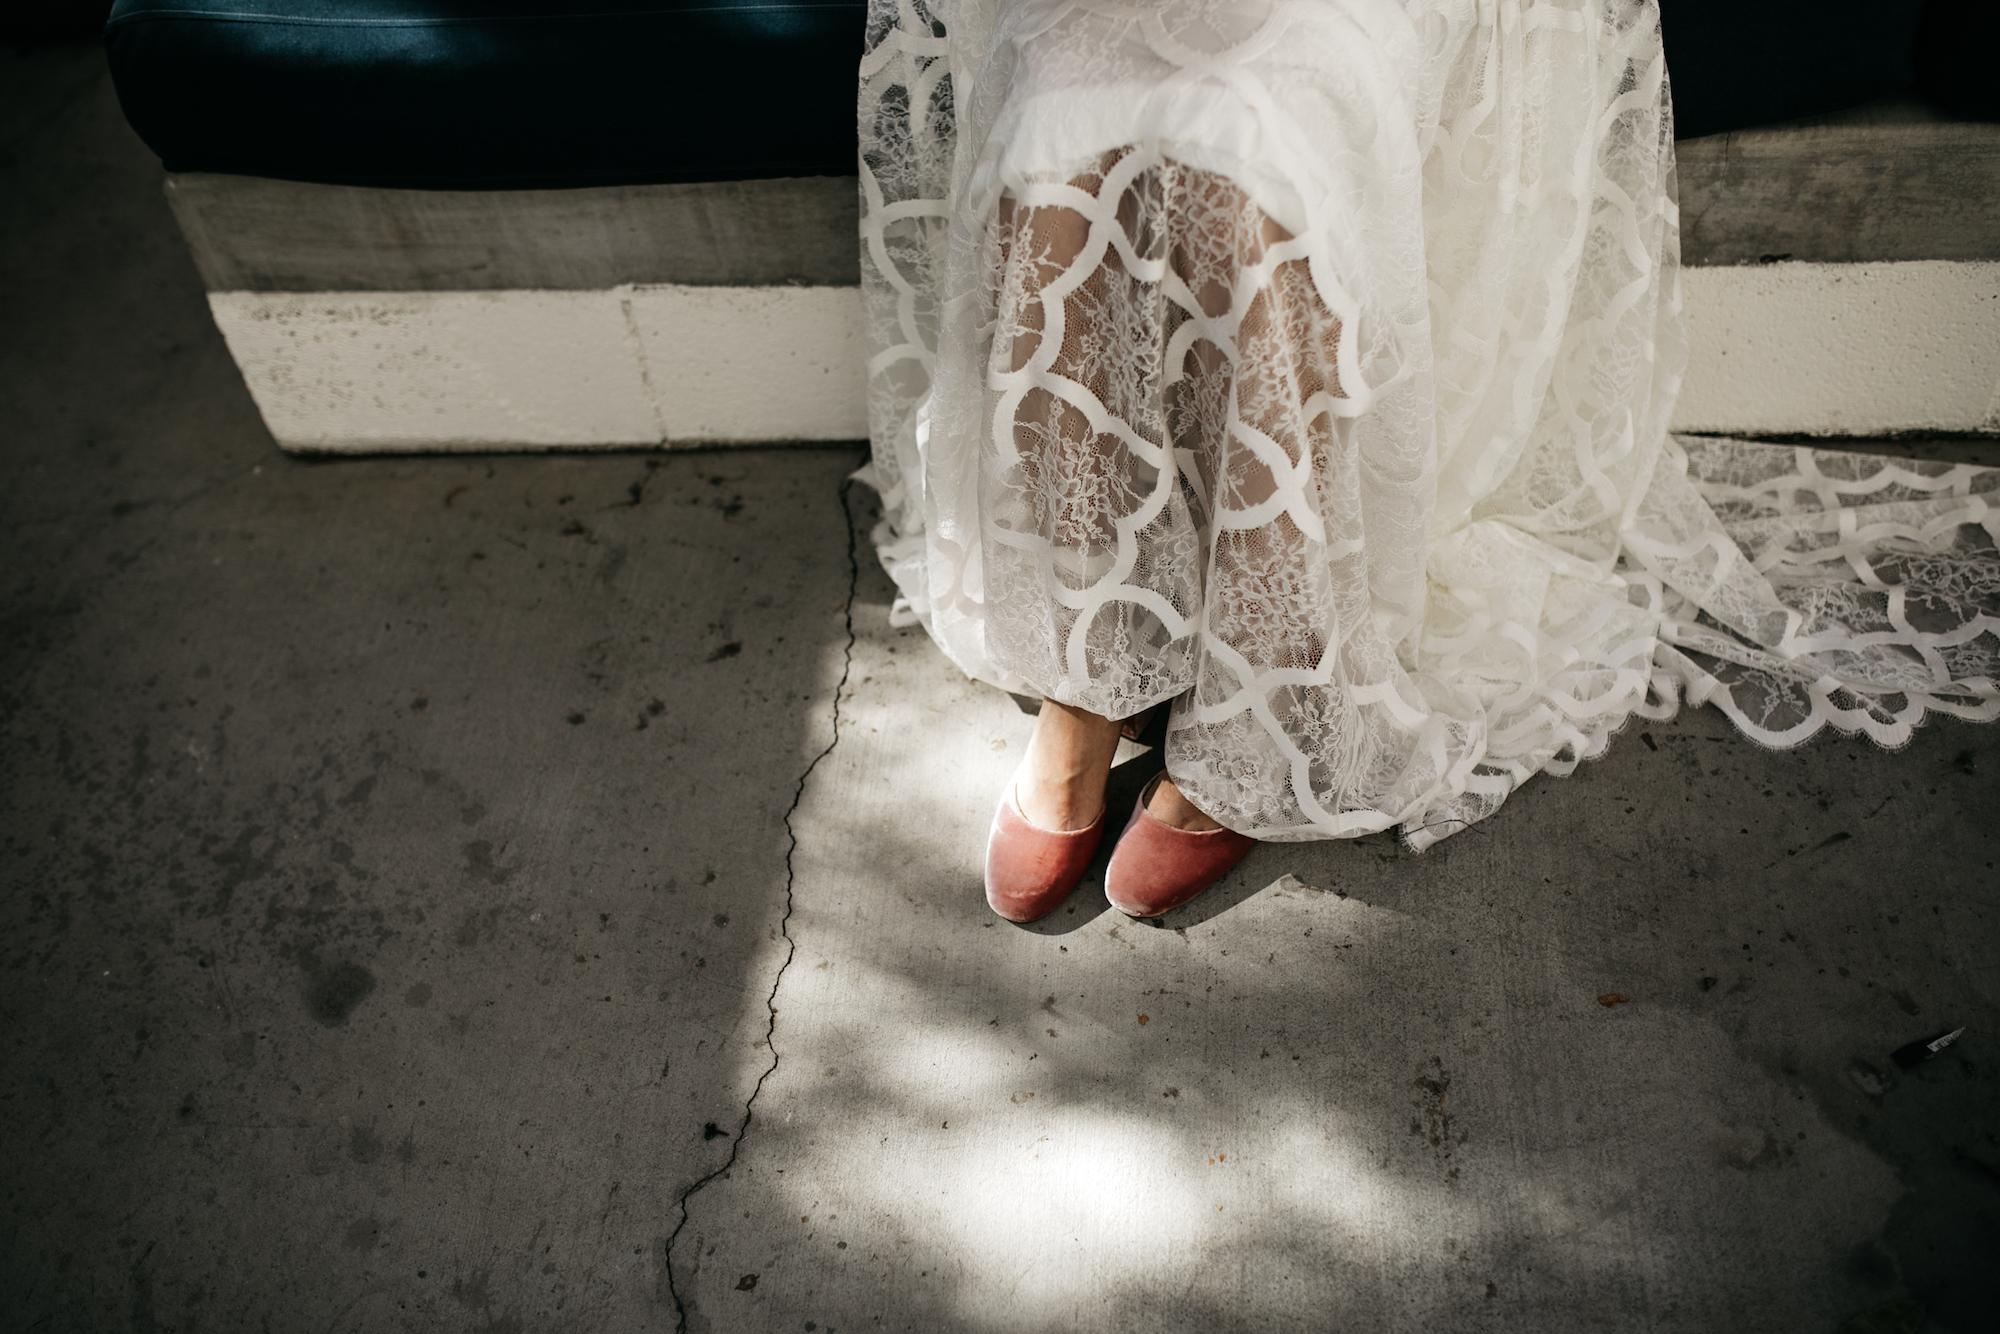 ace-hotel-palm-springs-wedding-photographer169.jpg